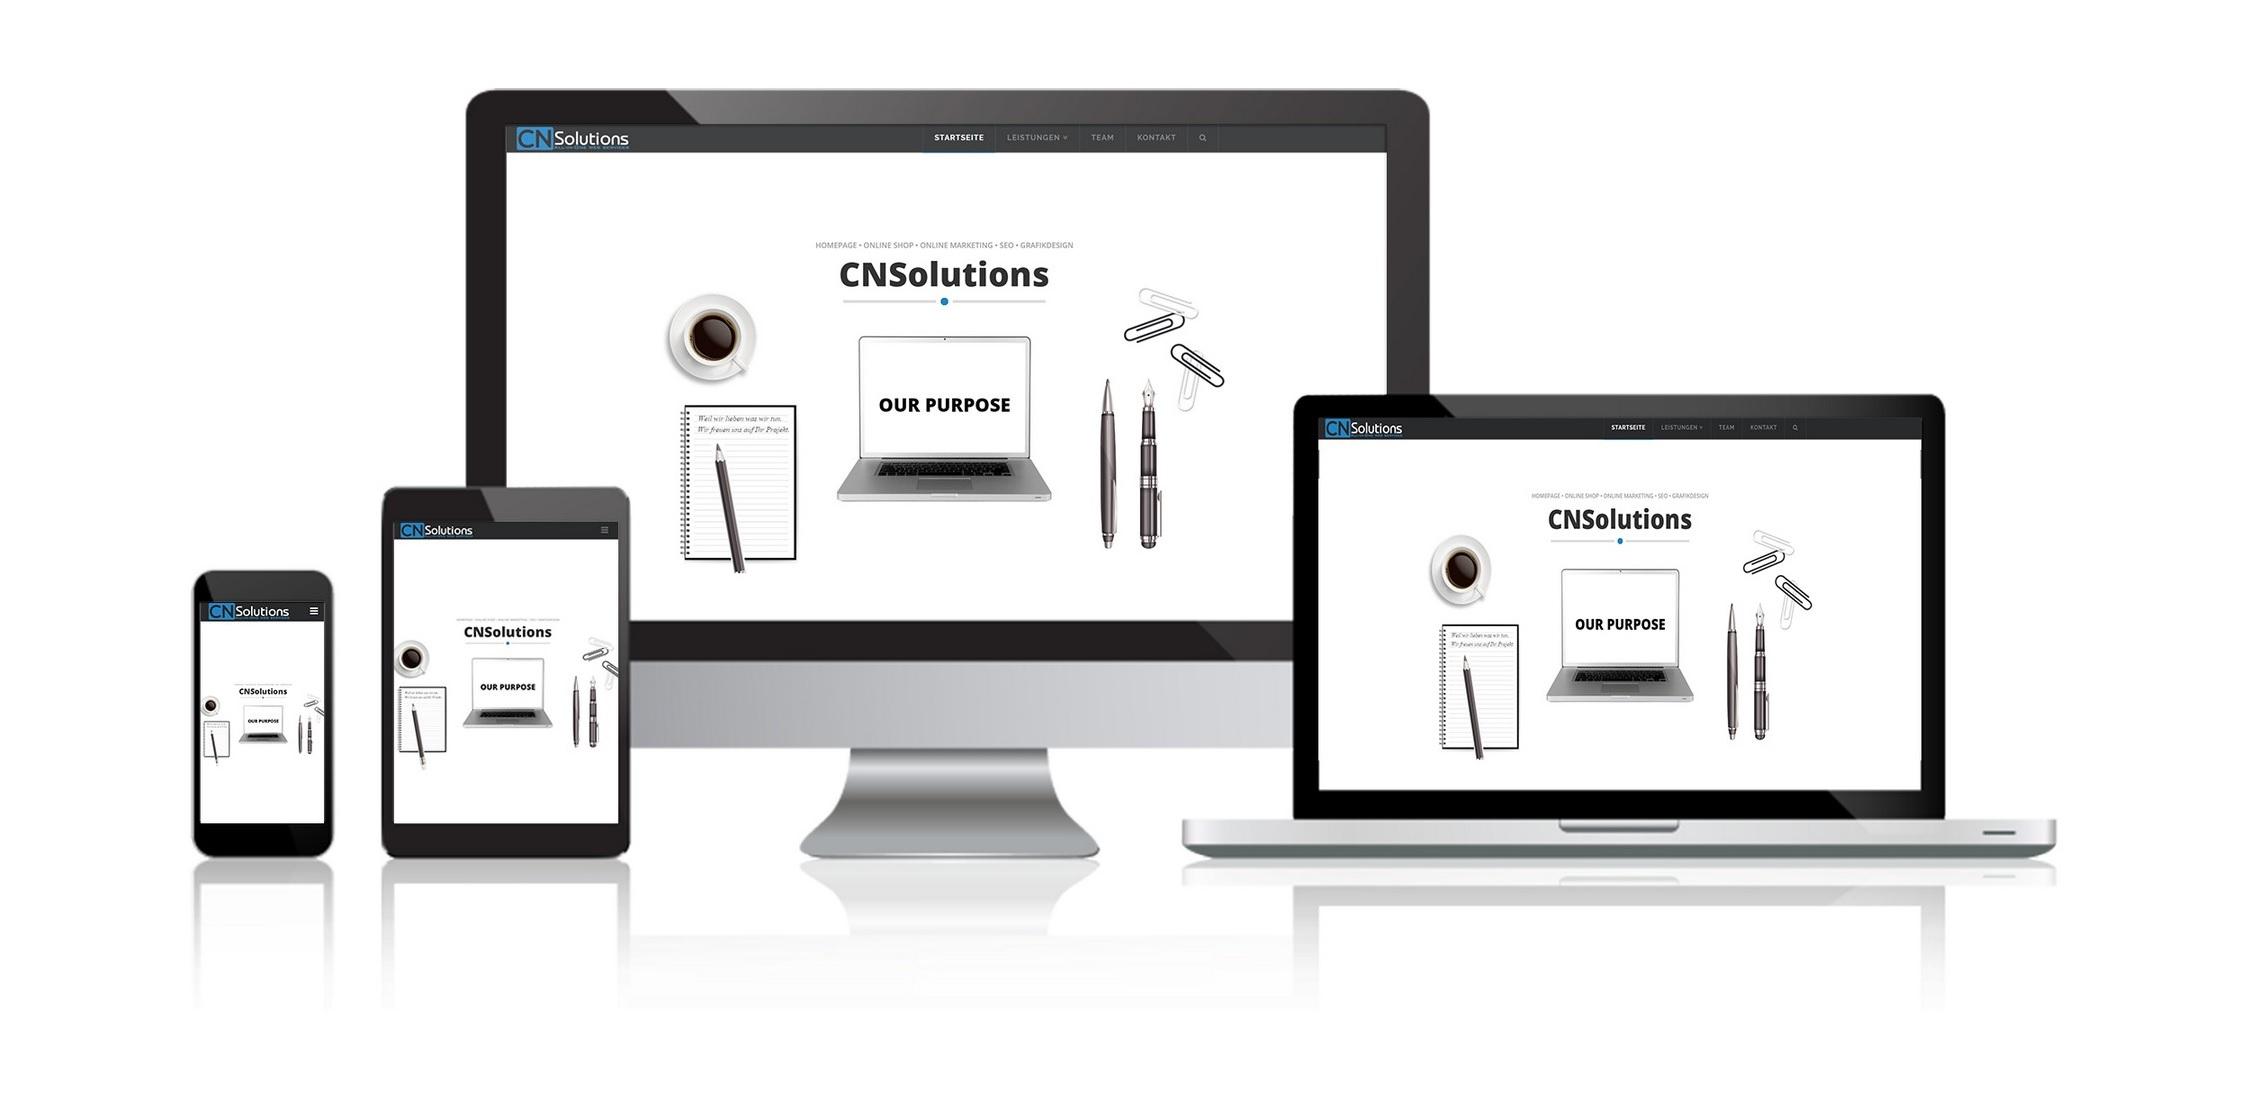 CNSolutions All-in-One web services - SEO - Webdesign - Online Marketing - Homepage und Online Shop - Grafikdesign